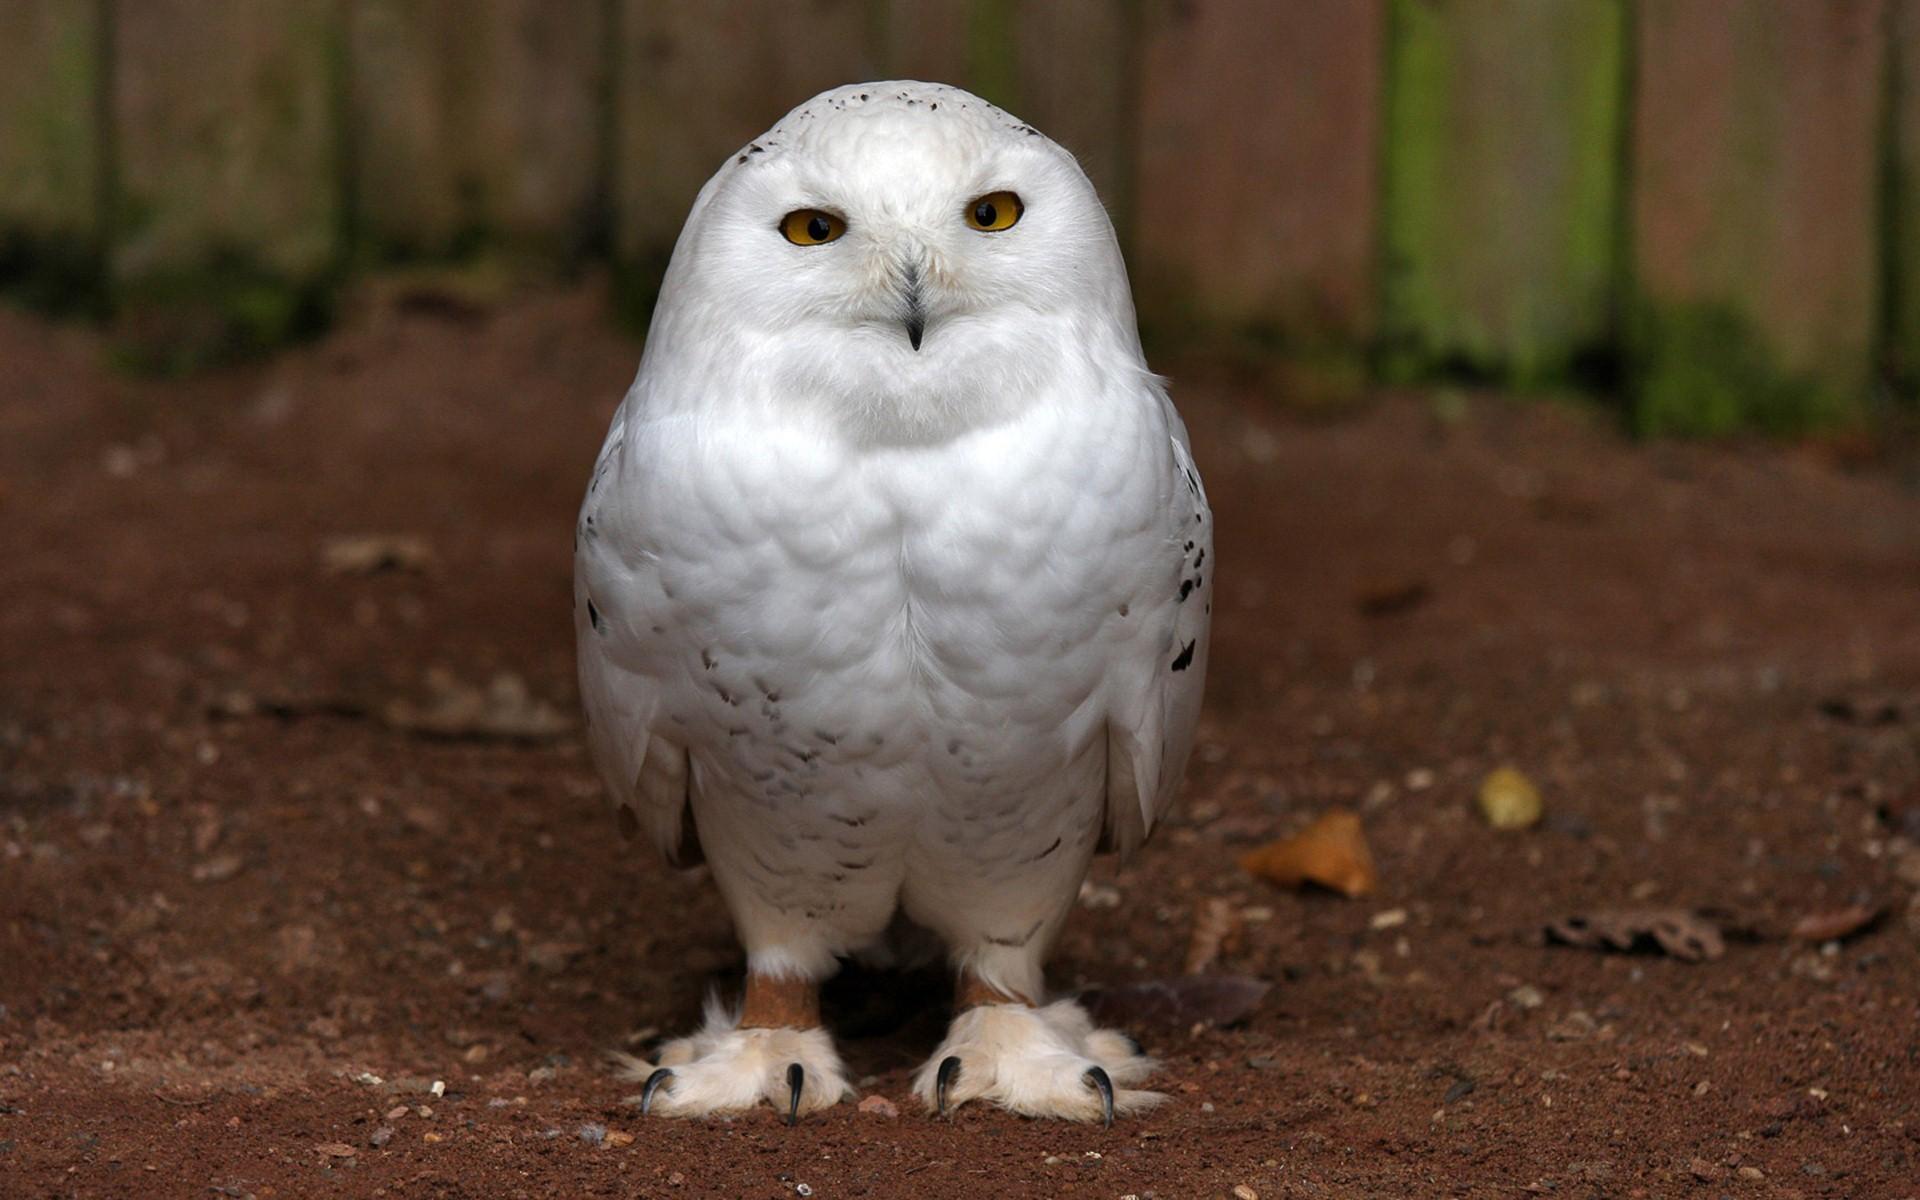 Res: 1920x1200, Cute White Owl Wallpaper